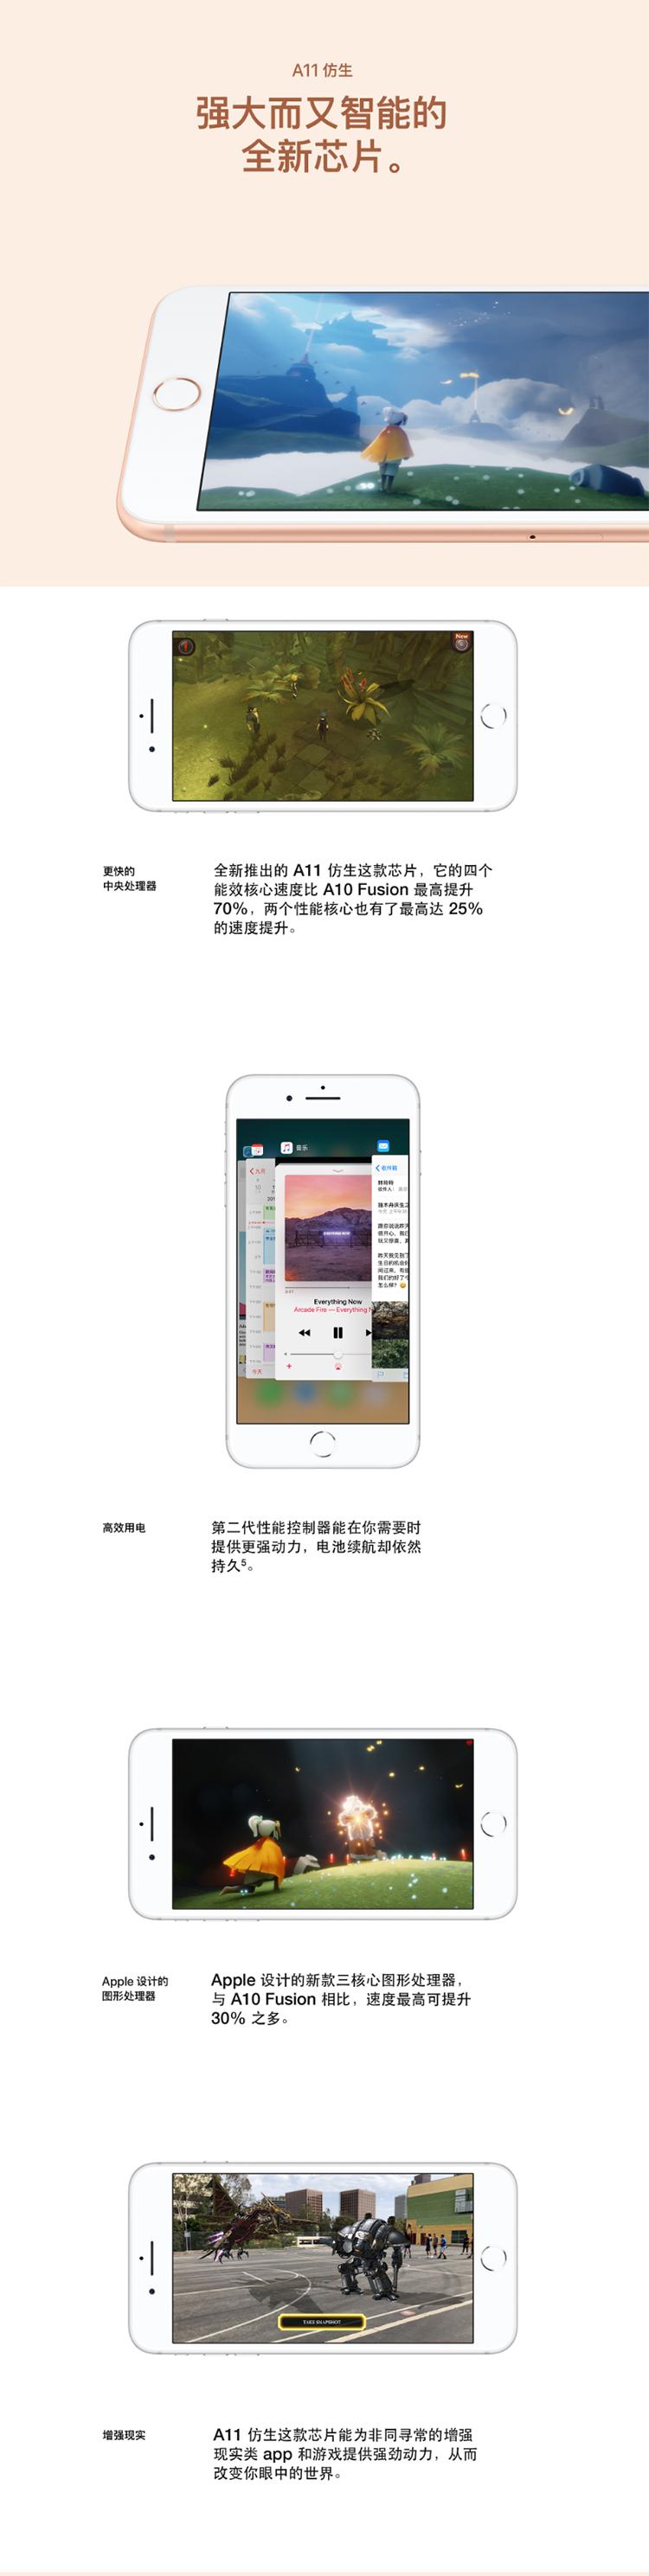 iPhone8pic5.jpg